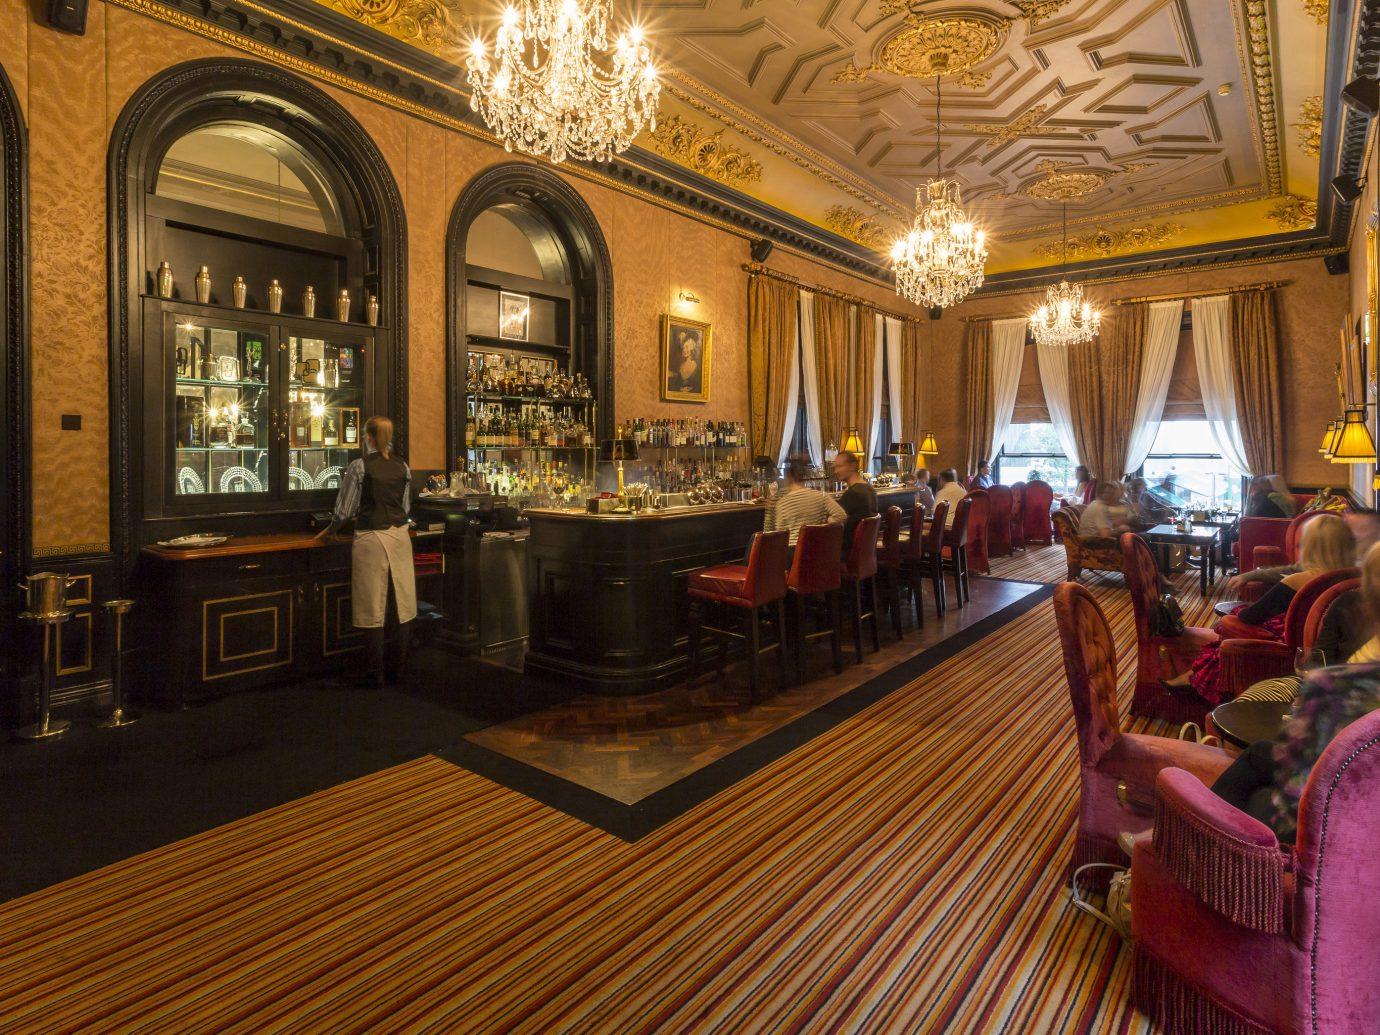 Hotels indoor building Lobby estate restaurant interior design palace Bar hall